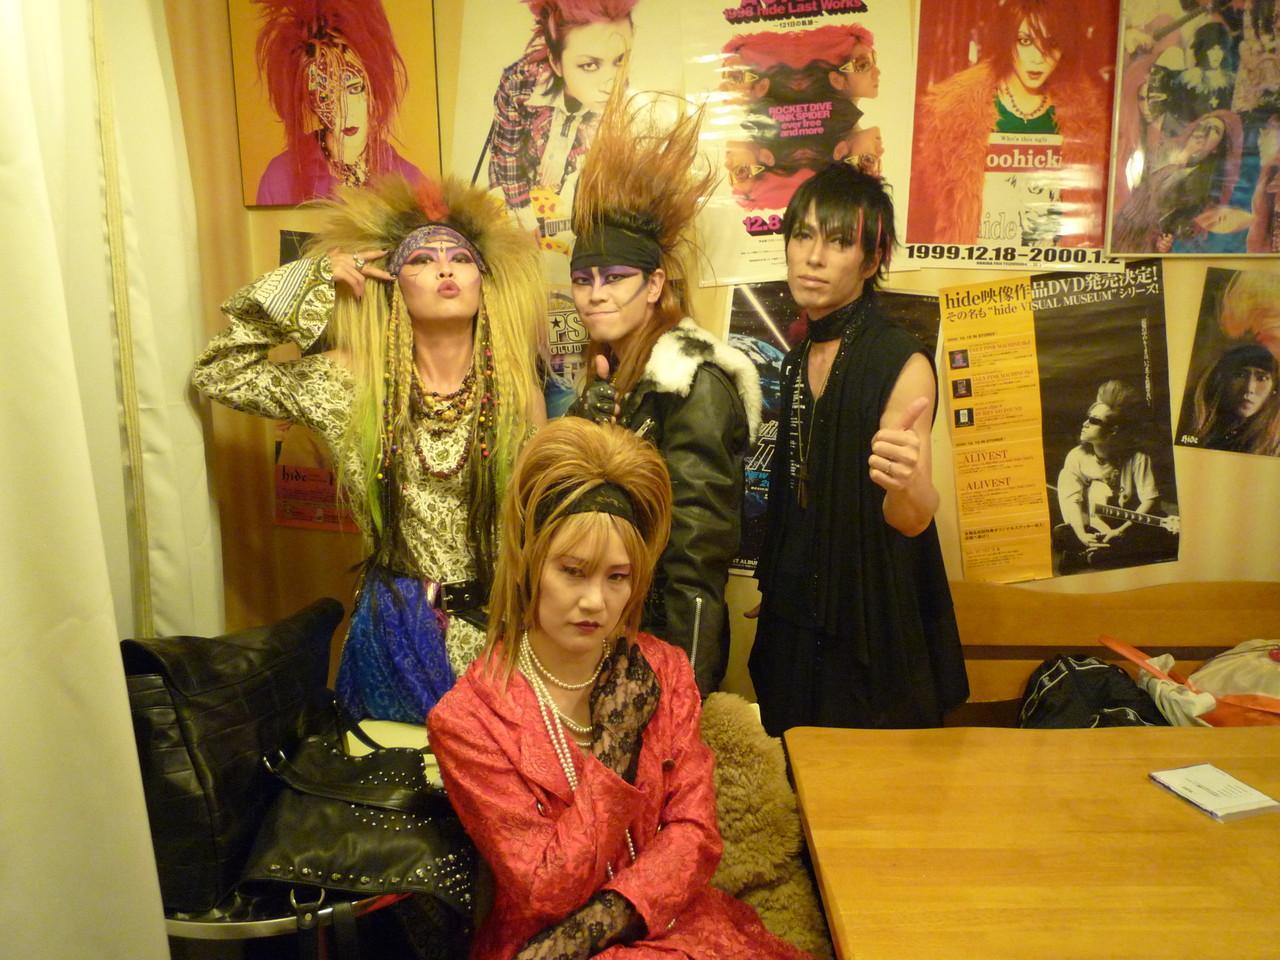 hideコスのCannaさん、YoshikiコスのMikaさん、X-HIROSHIMAのYUSHIさんと記念写真☆